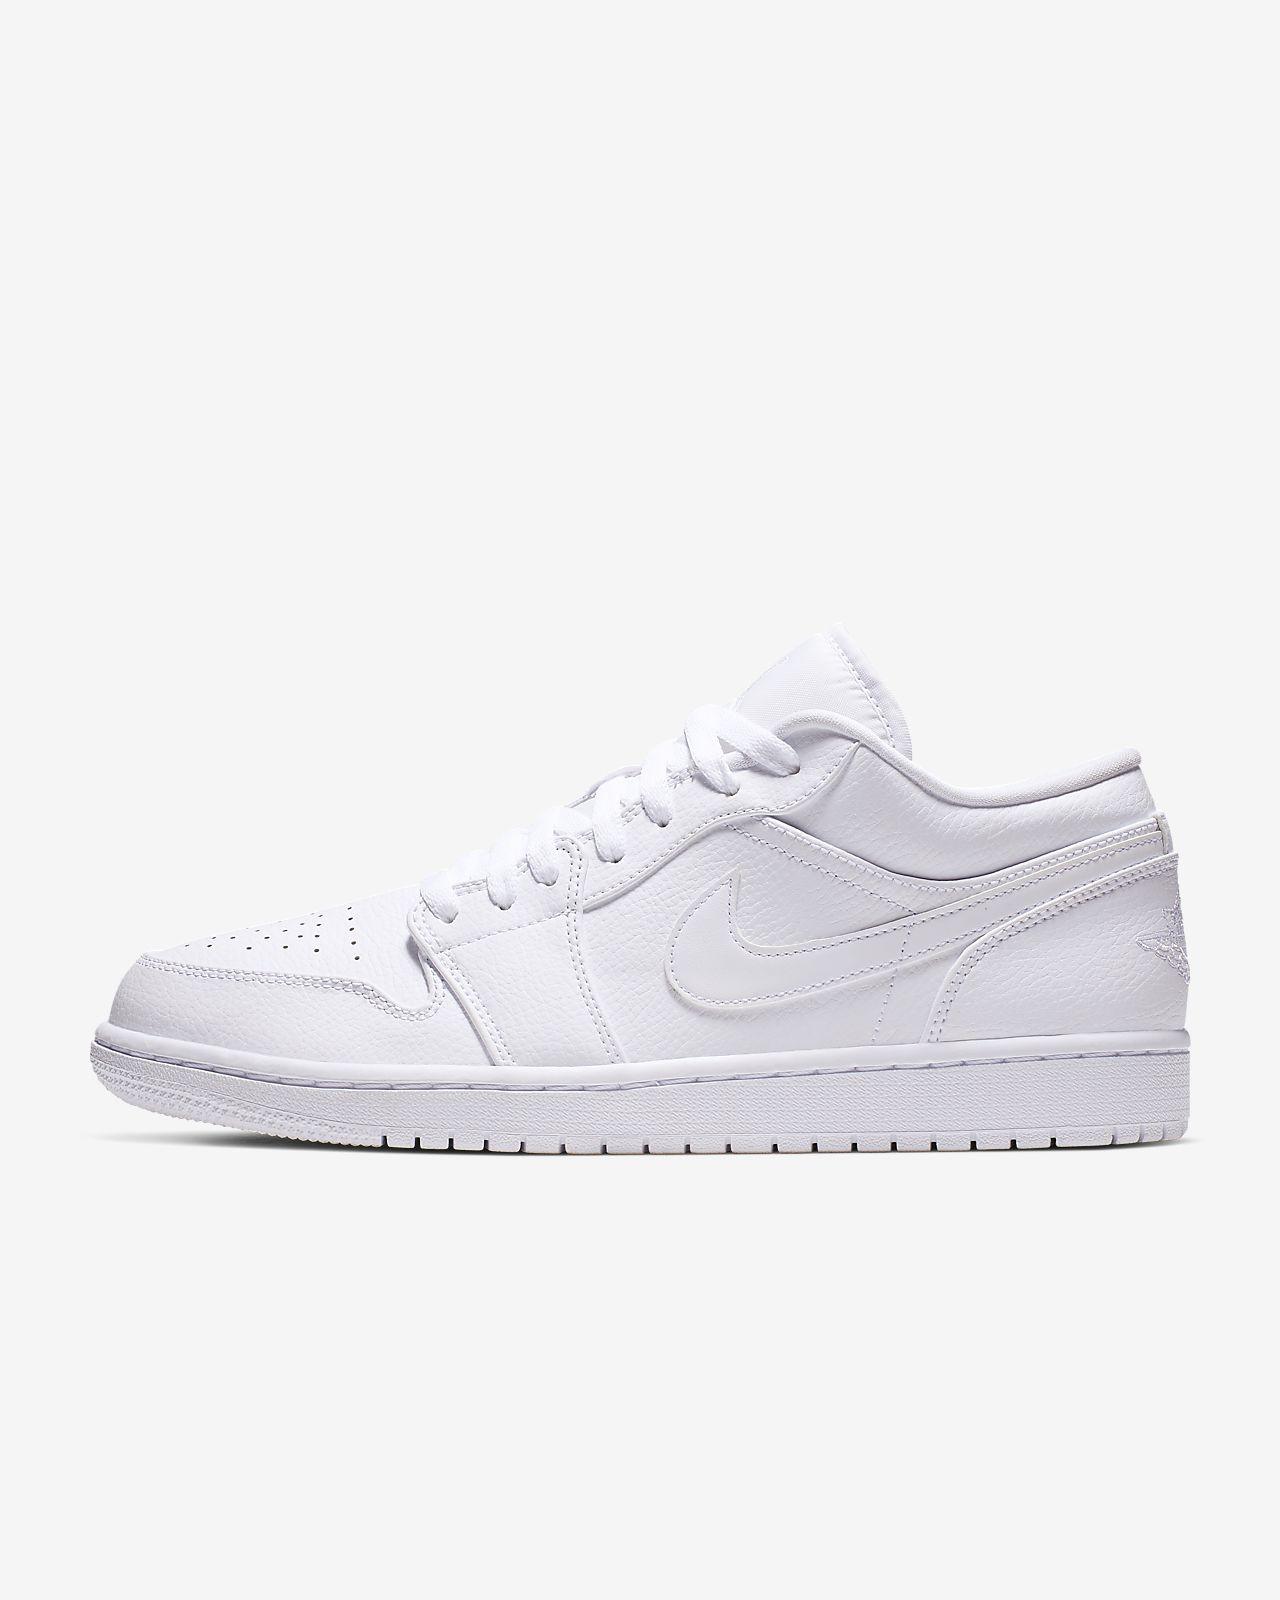 online store f6b66 8050b ... Chaussure Air Jordan 1 Low pour Homme